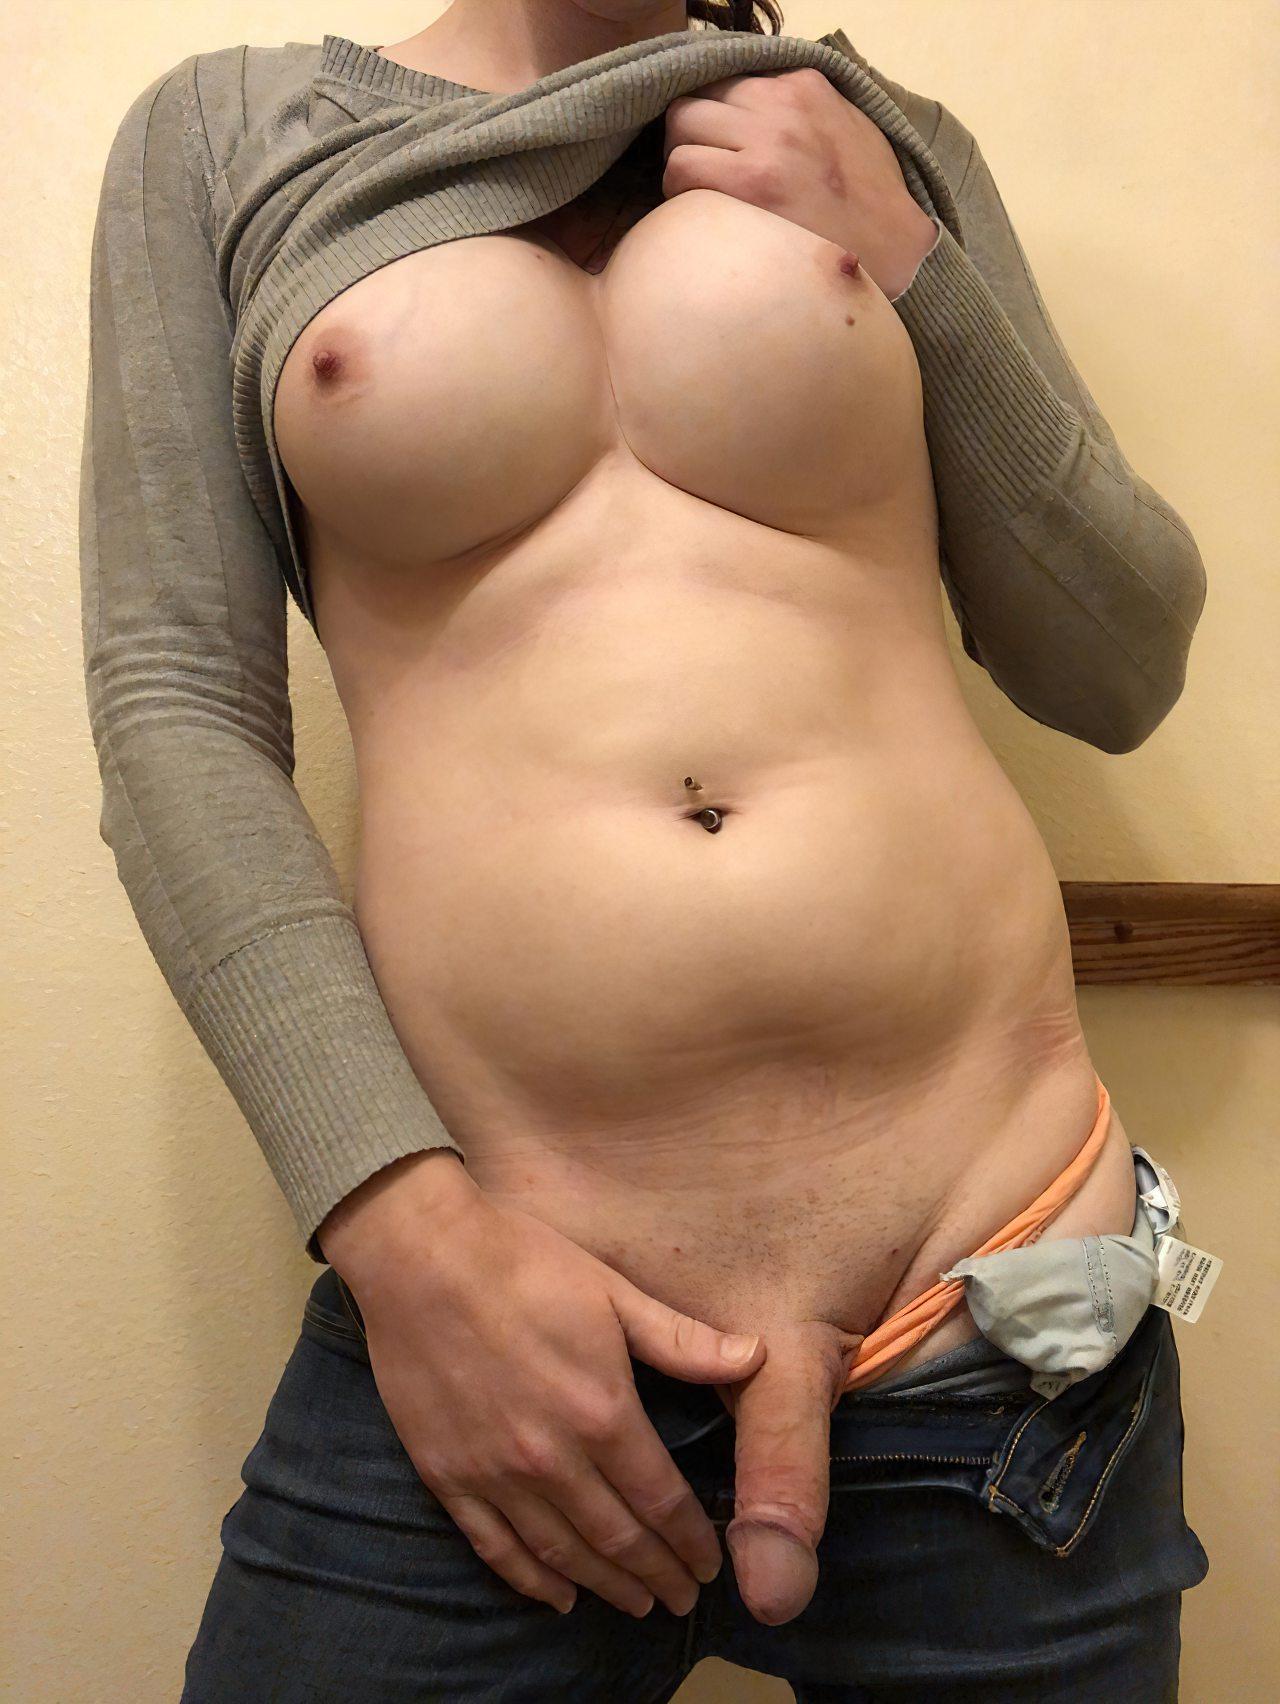 Fotos de Travestis (21)